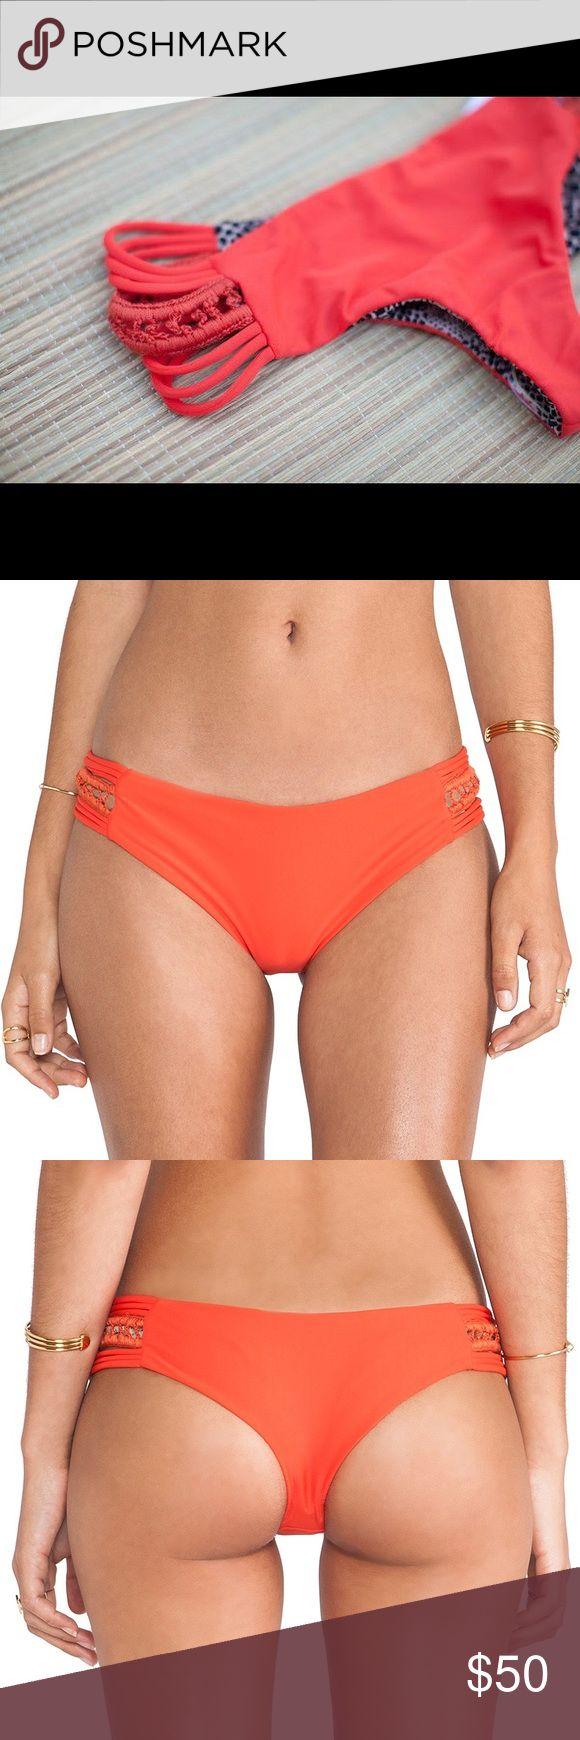 ACACIA PIKAKE BOTTOMS IN HIBISCUS ACACIA PIKAKE BOTTOMS IN HIBISCUS / XS-Petite / Lightly Used / PAY ON V E N M O @ amberthelyon acacia swimwear Swim Bikinis